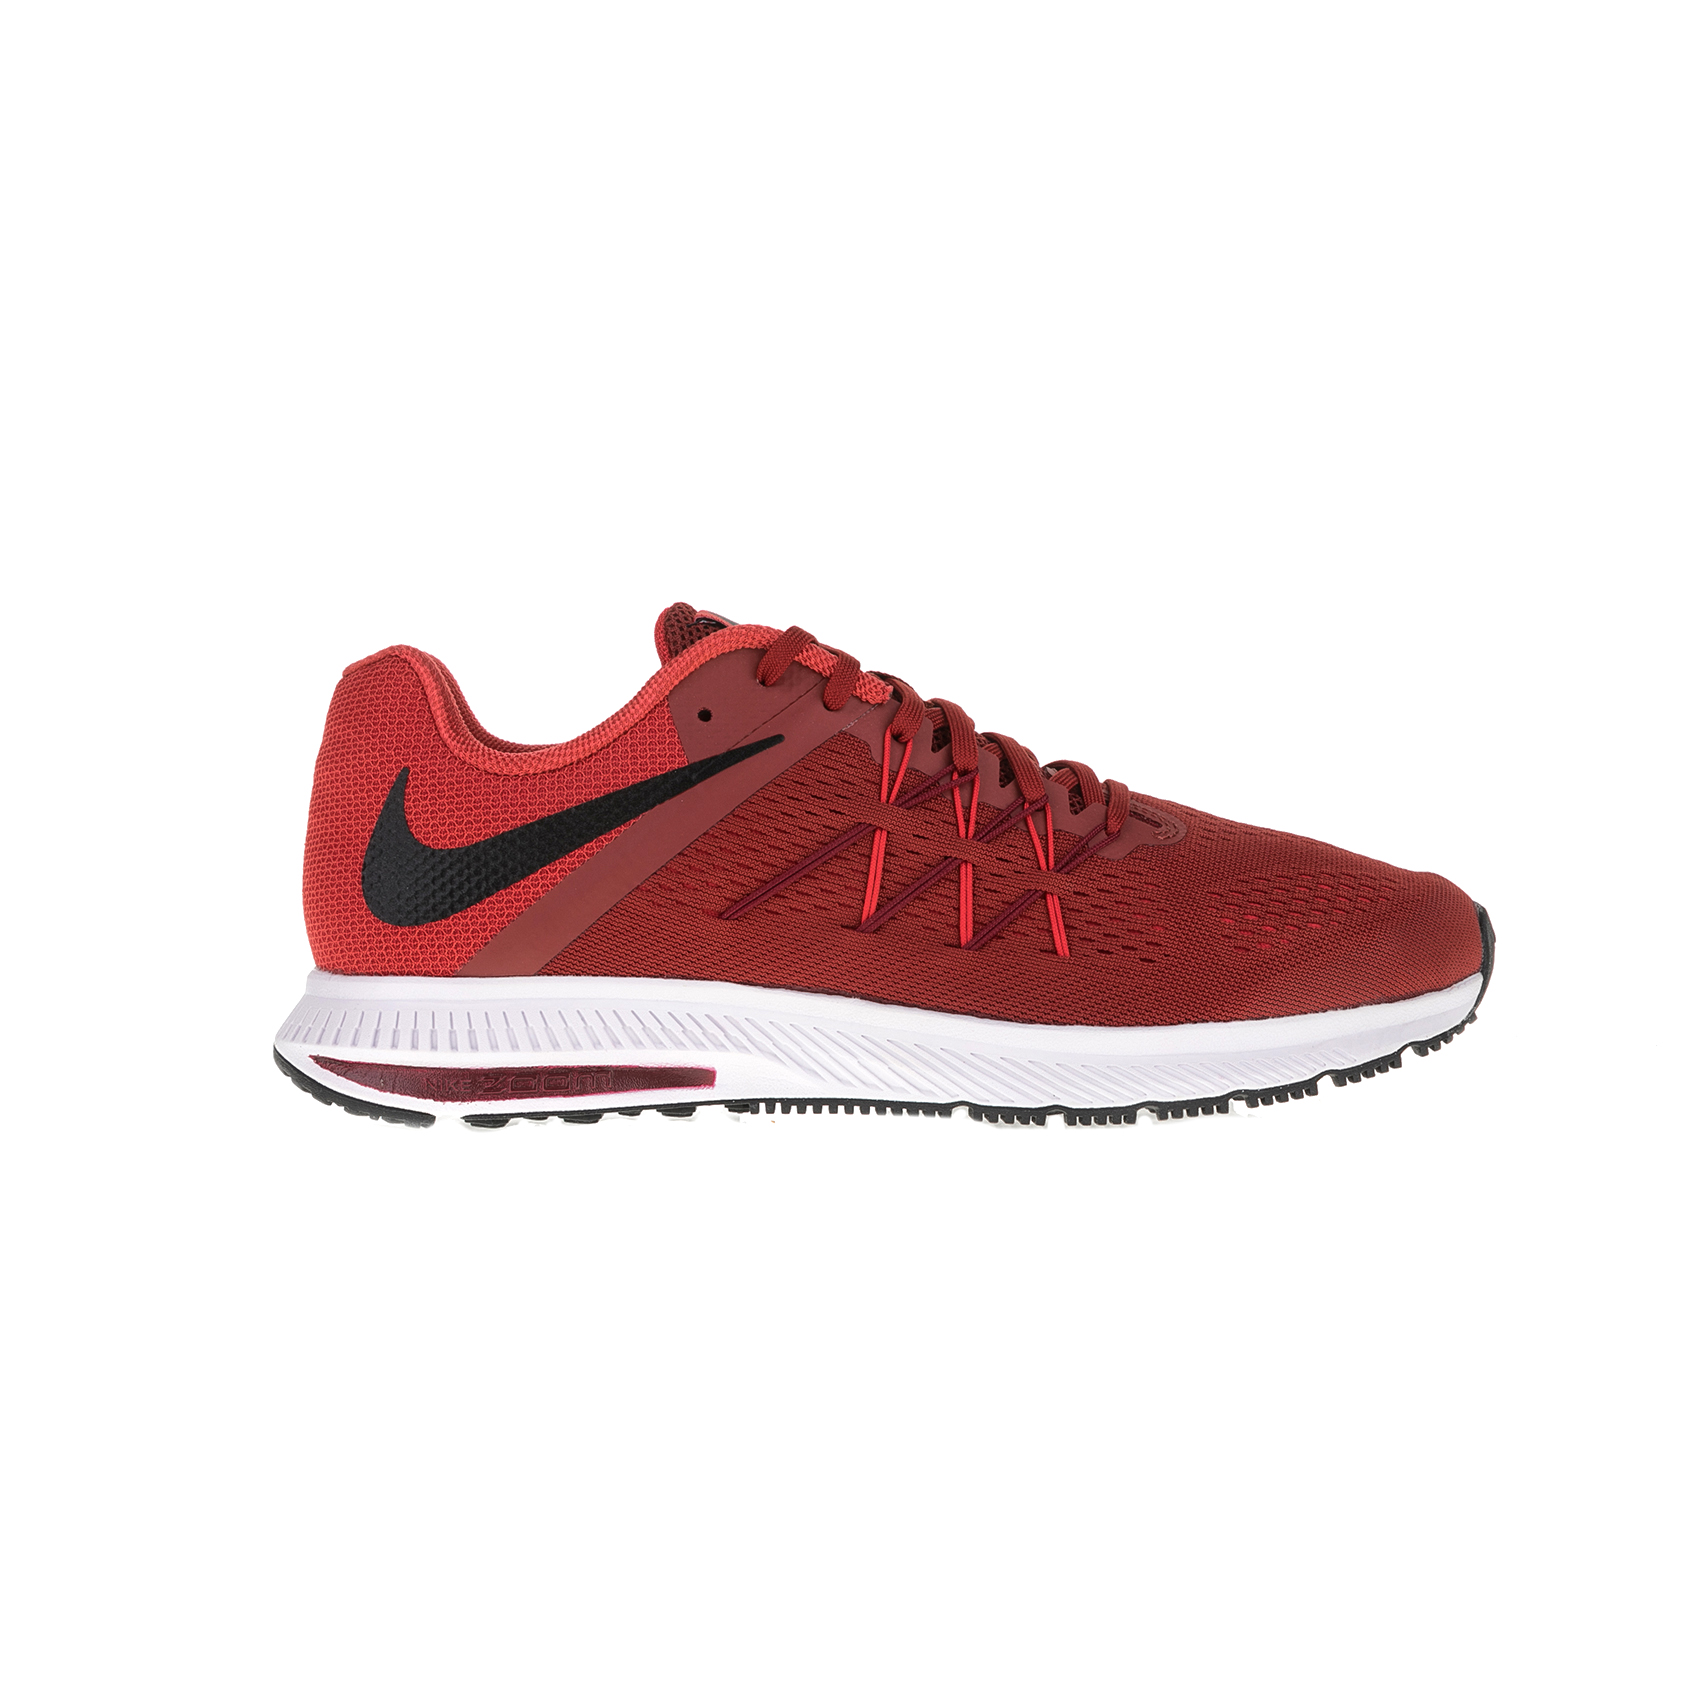 NIKE – Ανδρικά αθλητικά παπούτσια Nike ZOOM WINFLO 3 κόκκινα